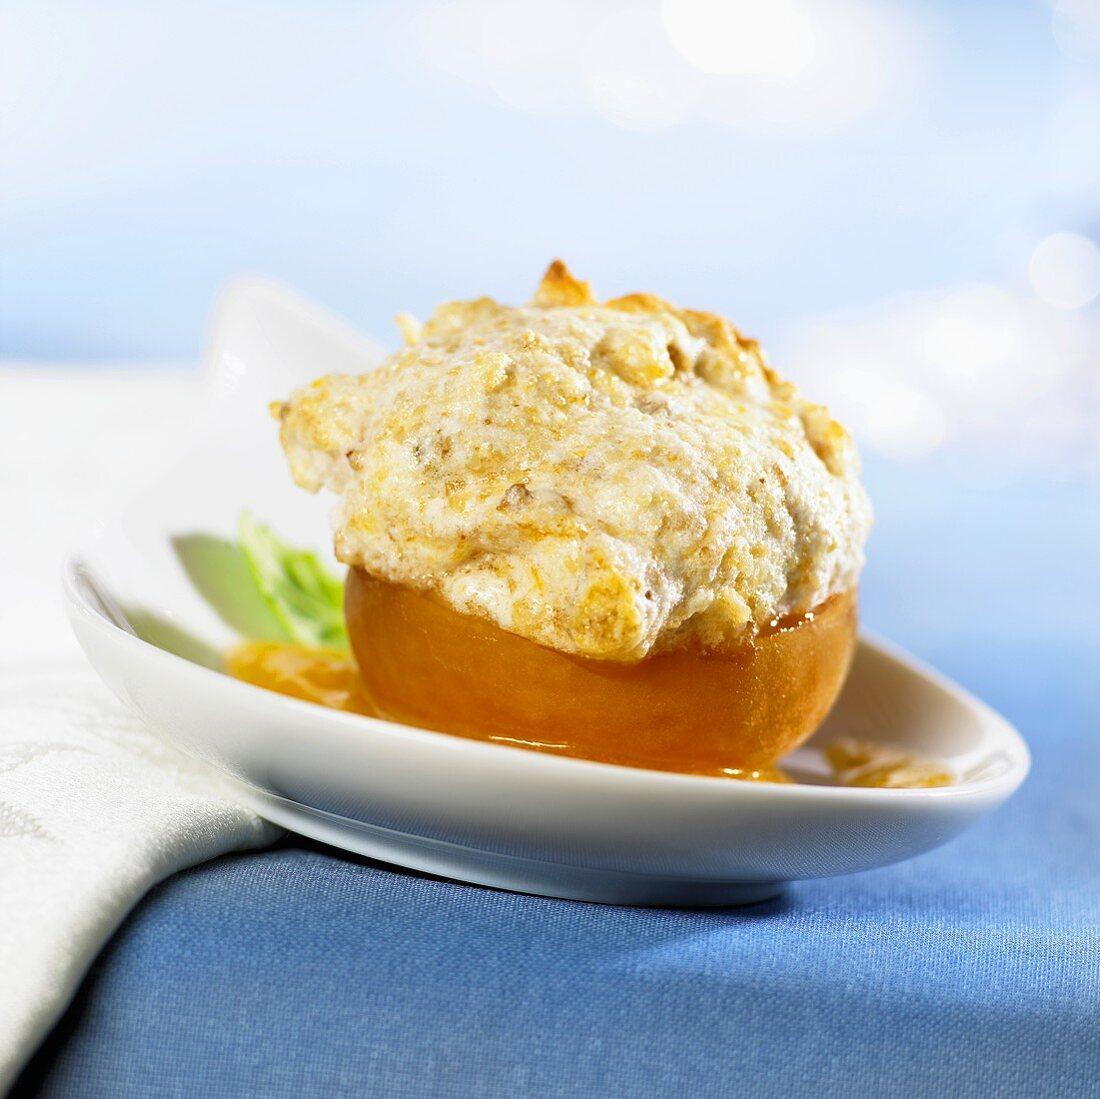 Apricot stuffed with Amaretto almond foam